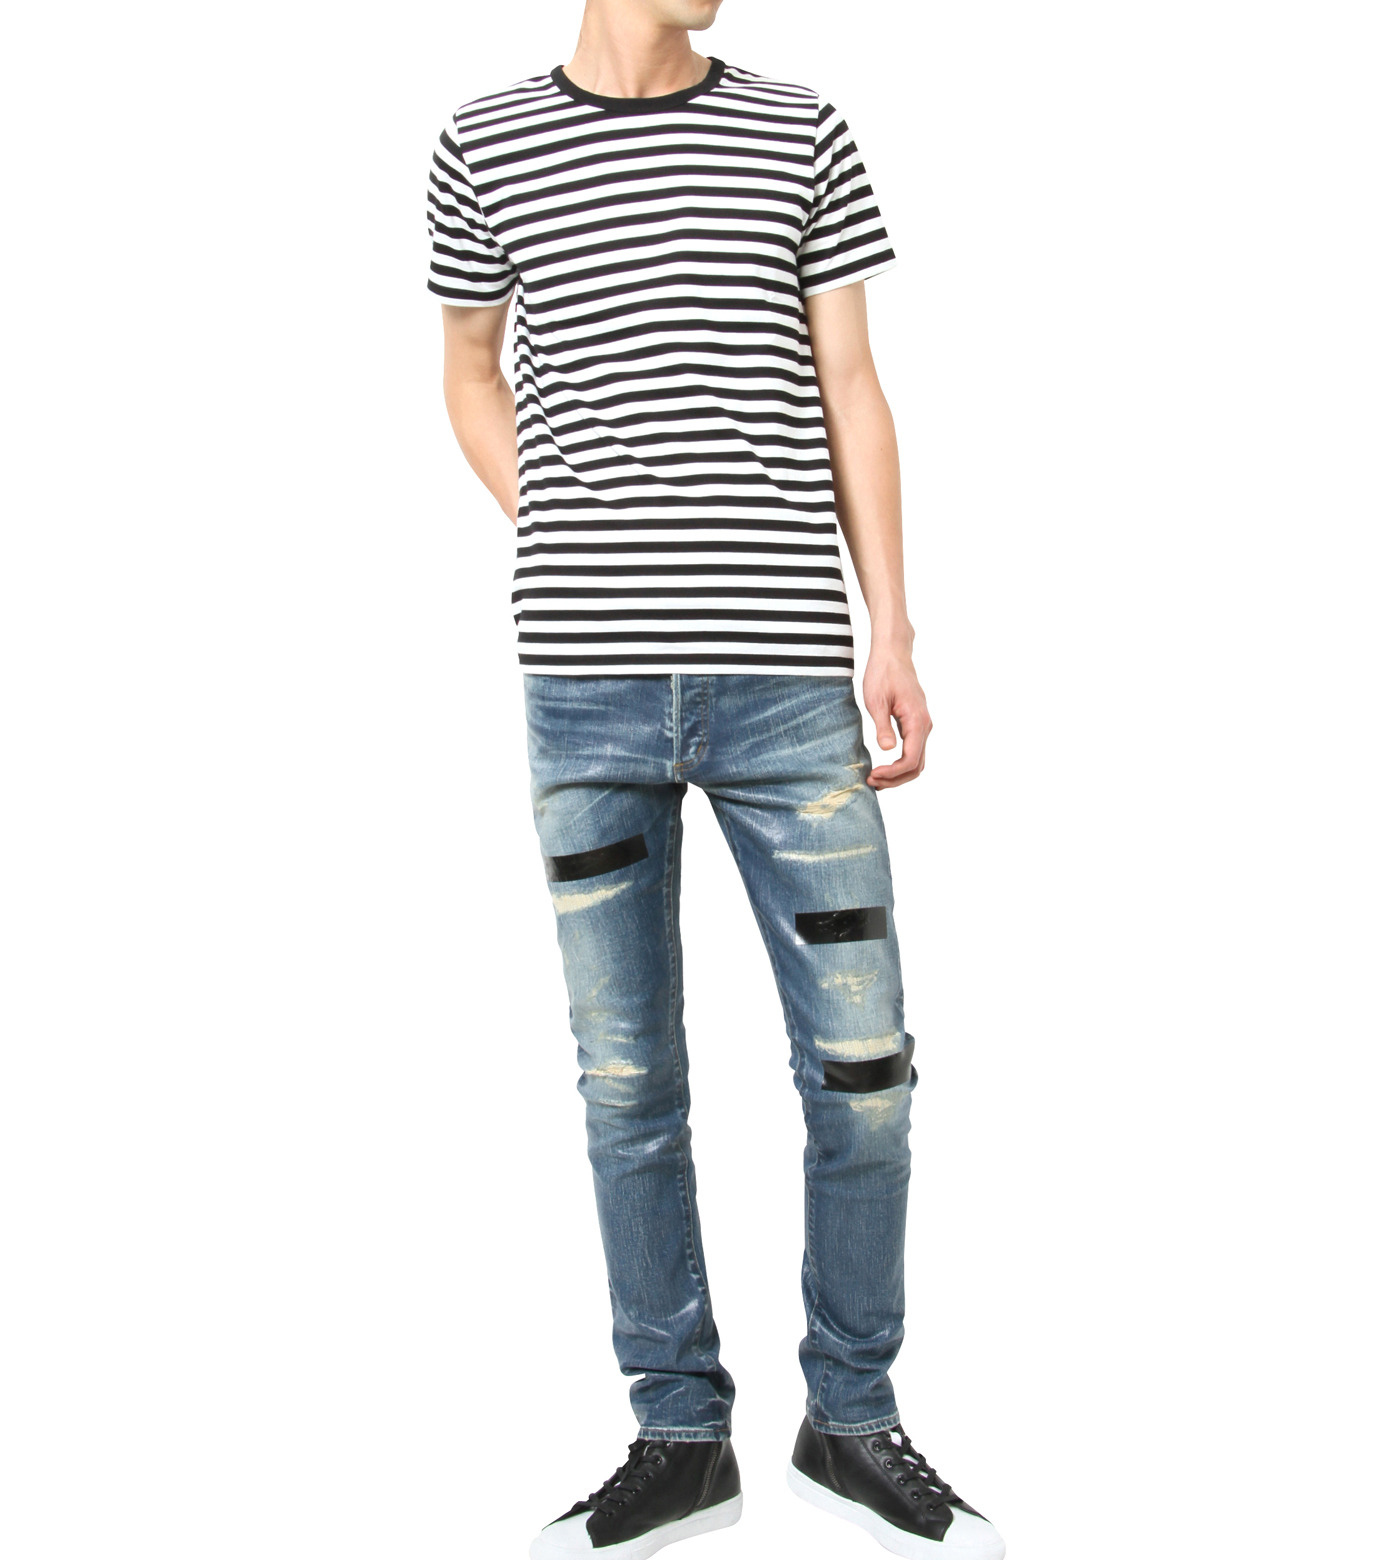 HL HEDDIE LOVU(エイチエル・エディールーヴ)のIndigo Coat Skin Slim-NAVY(パンツ/pants)-17S98005-93 拡大詳細画像3